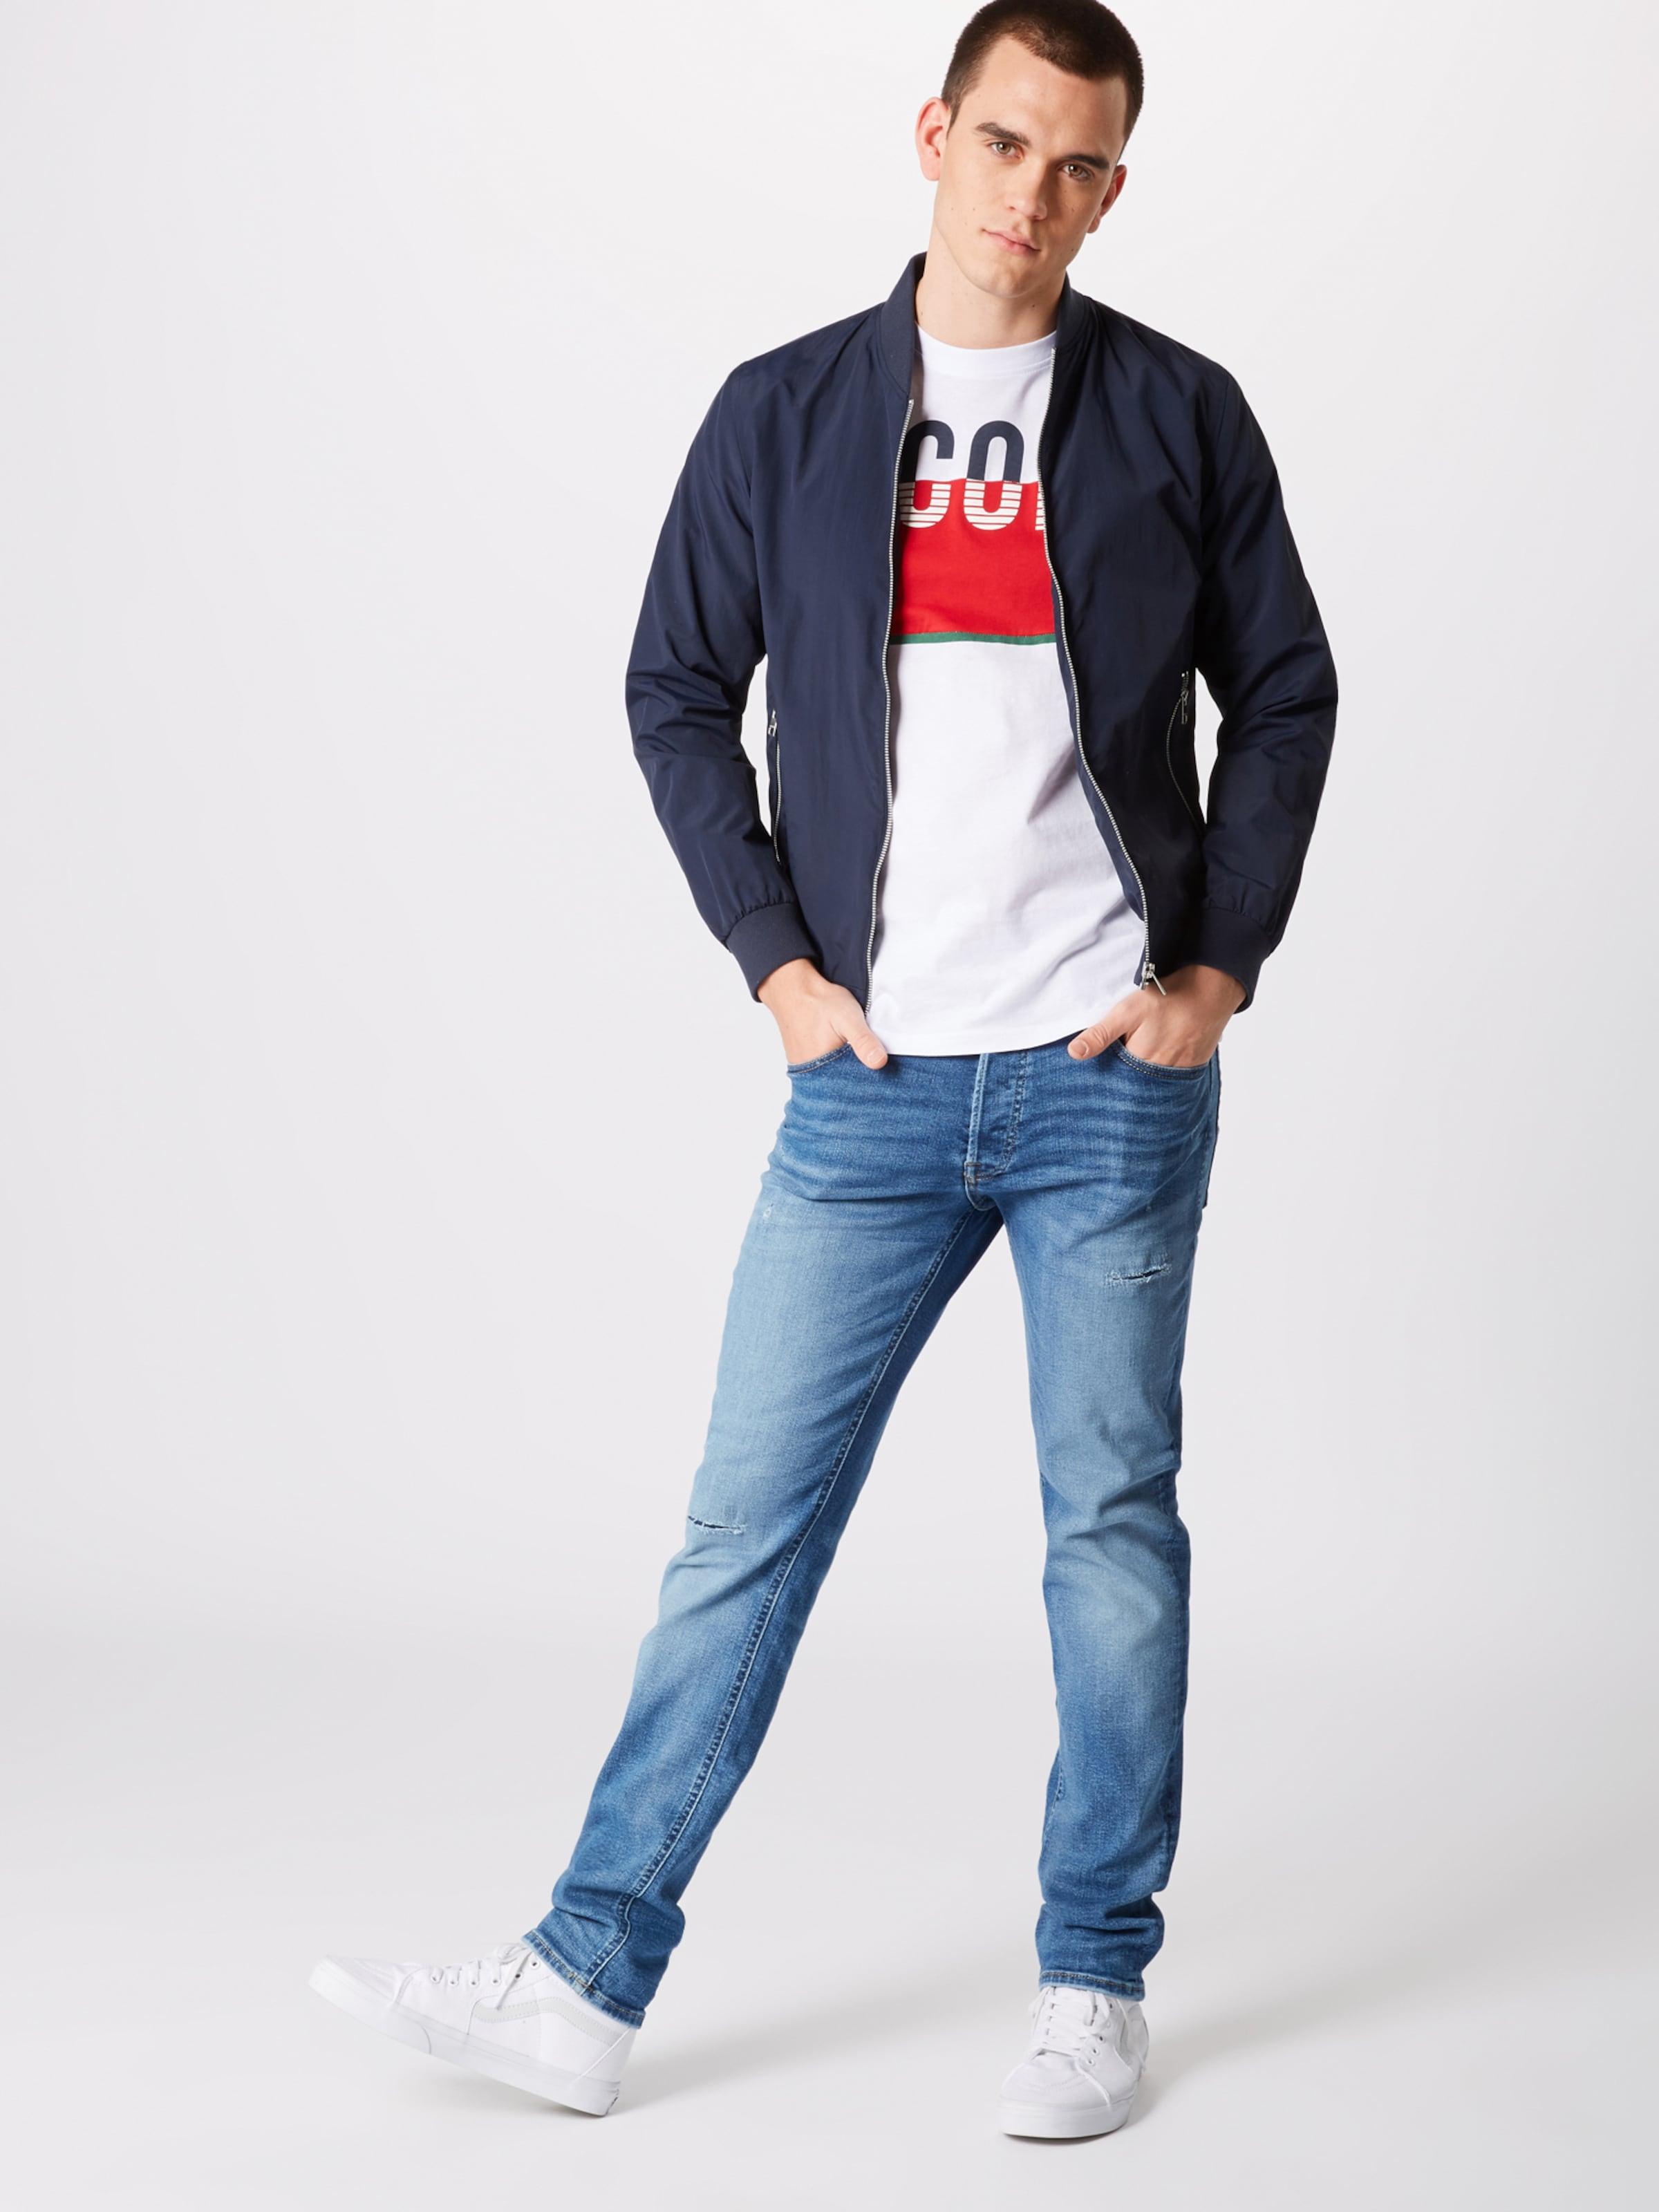 In Weiß T KobaltblauDunkelgrün Jackamp; Jones Rot shirt On80wkP